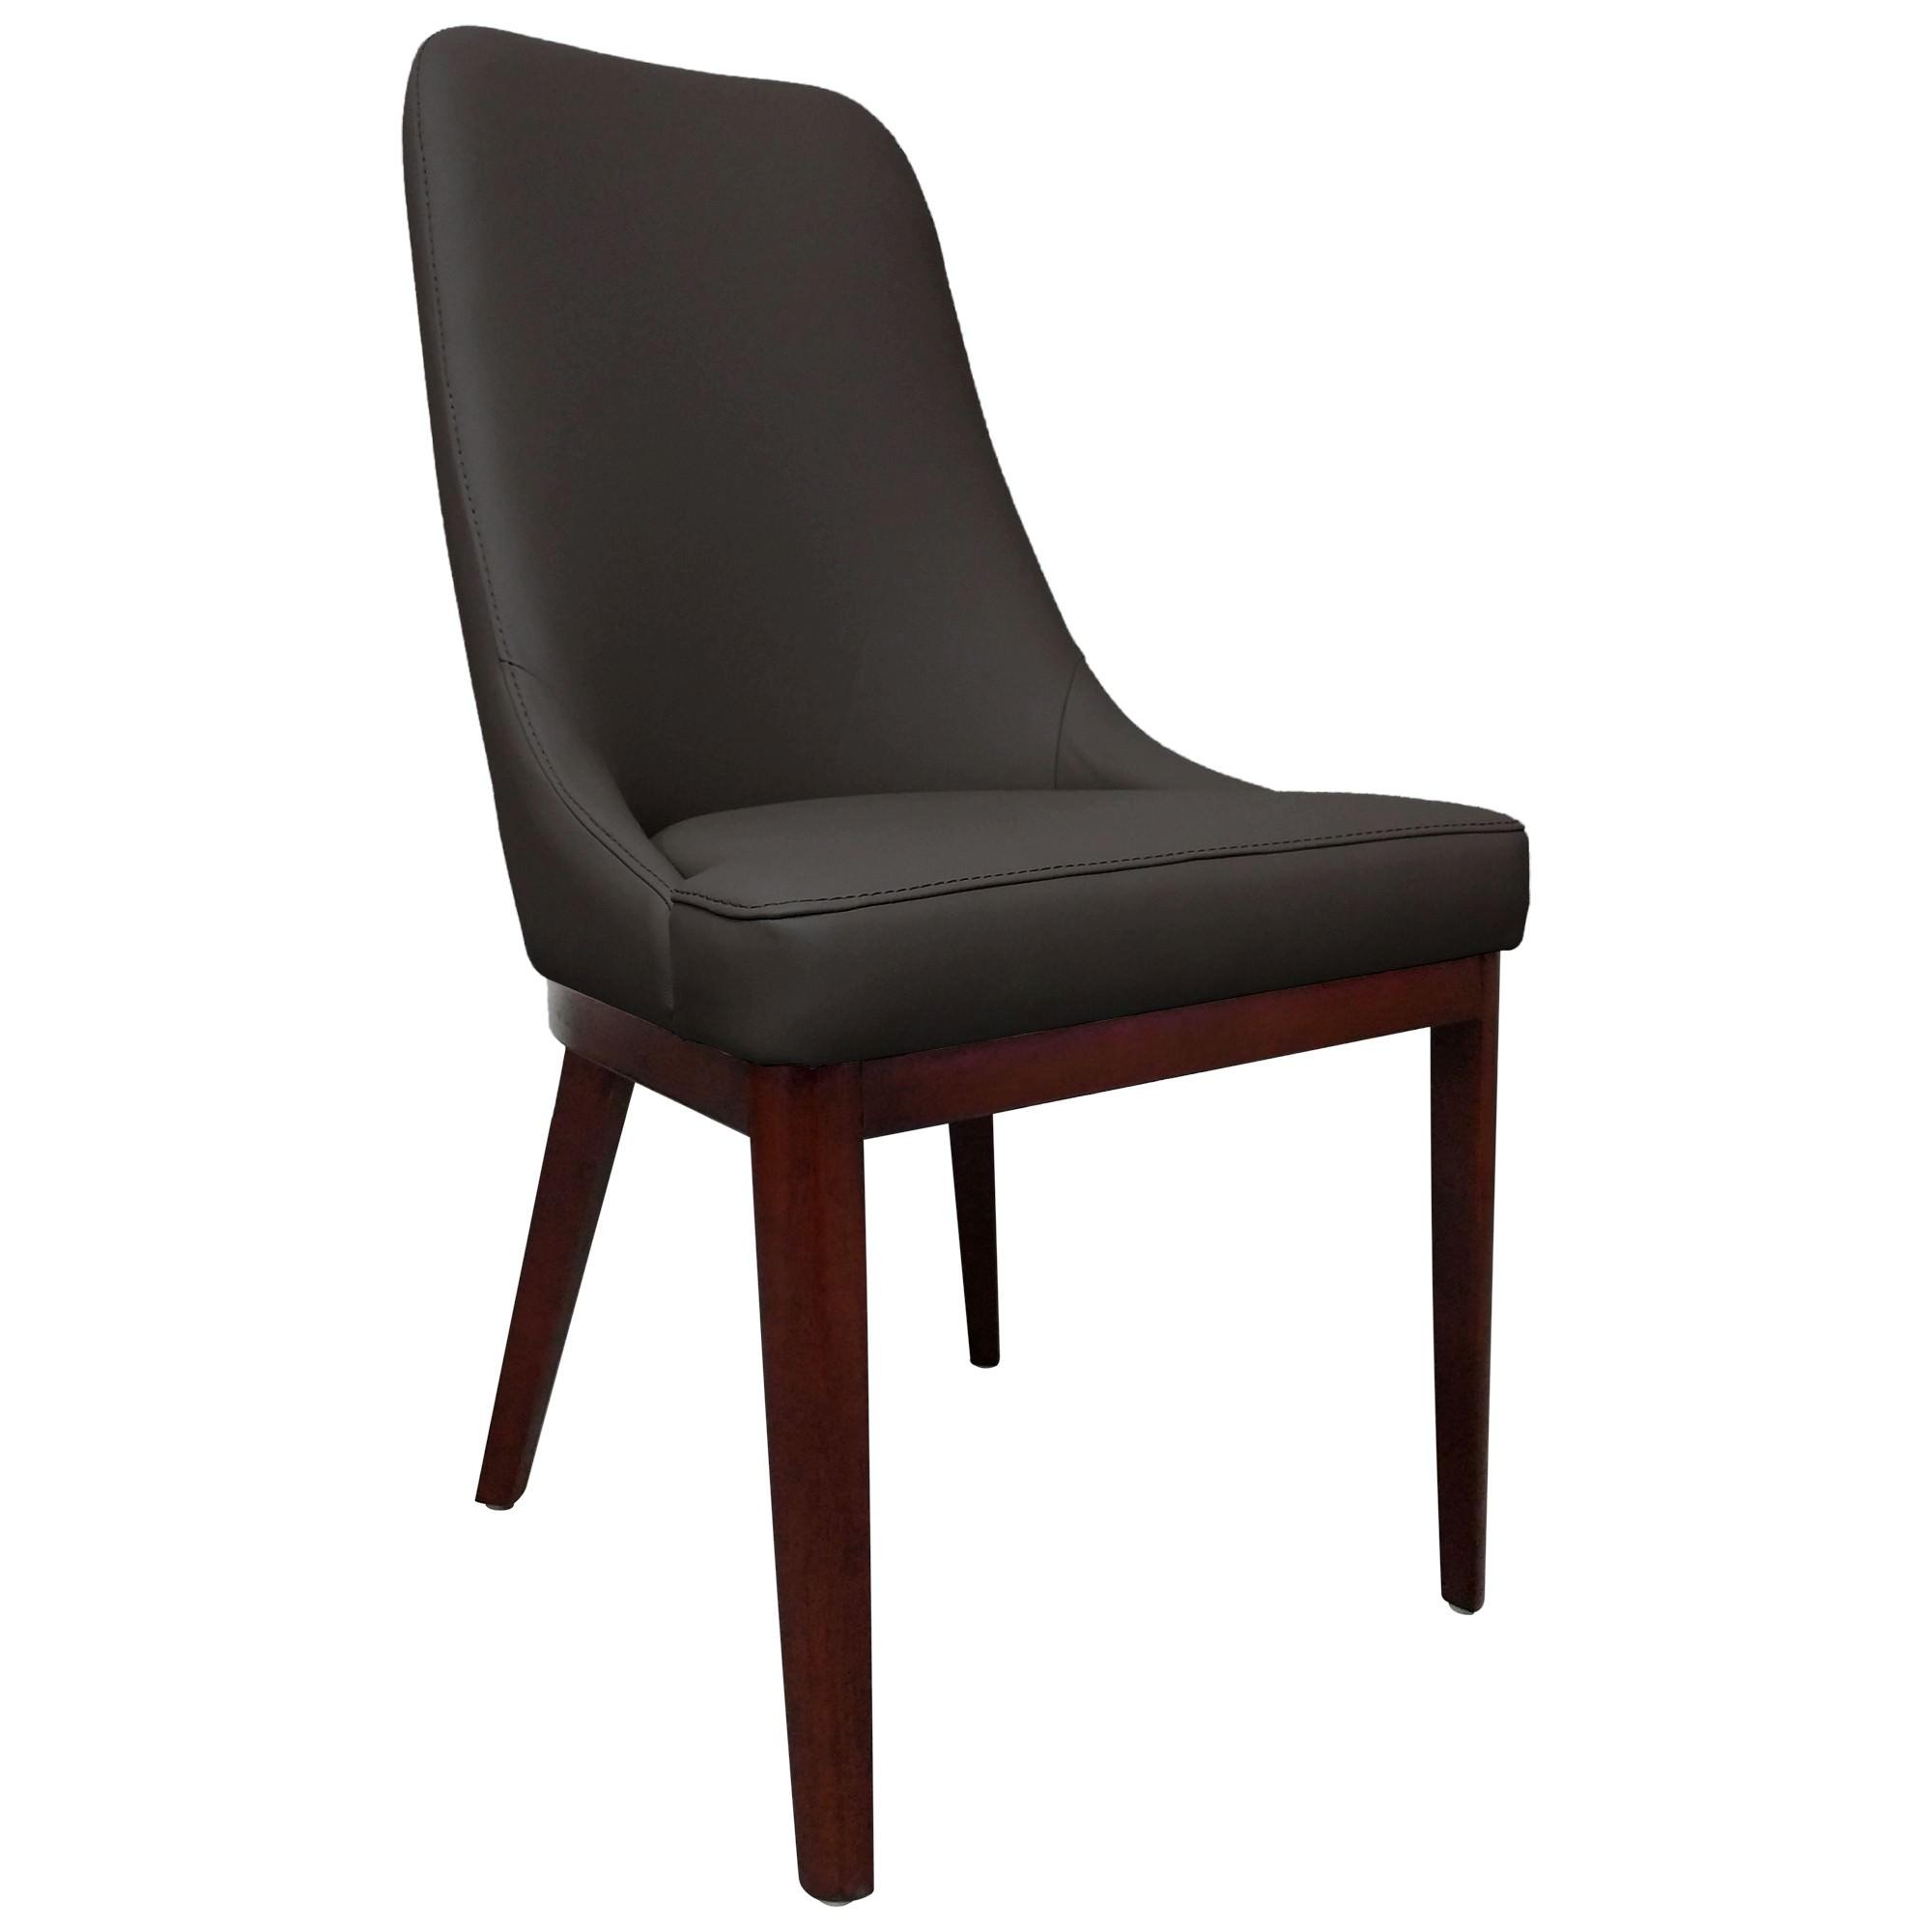 Sarah Leather Dining Chair, Dark Brown